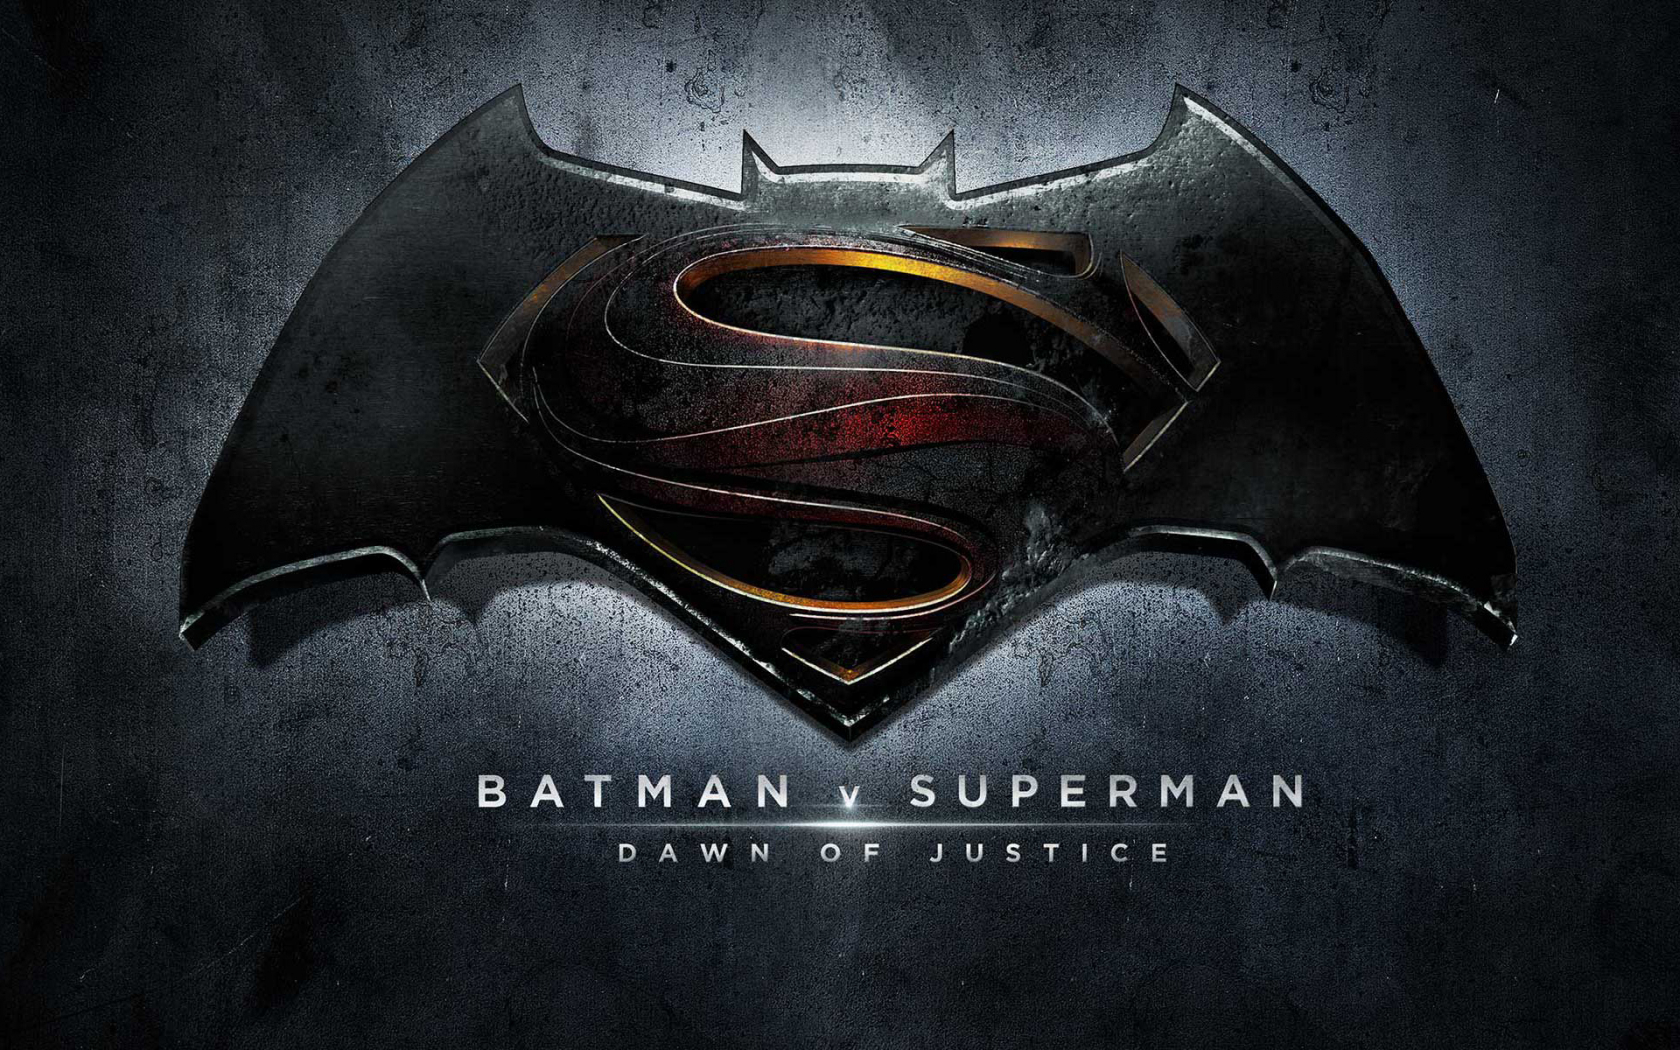 Free Download Download Batman Vs Superman Dawn Of Justice Logo Hd